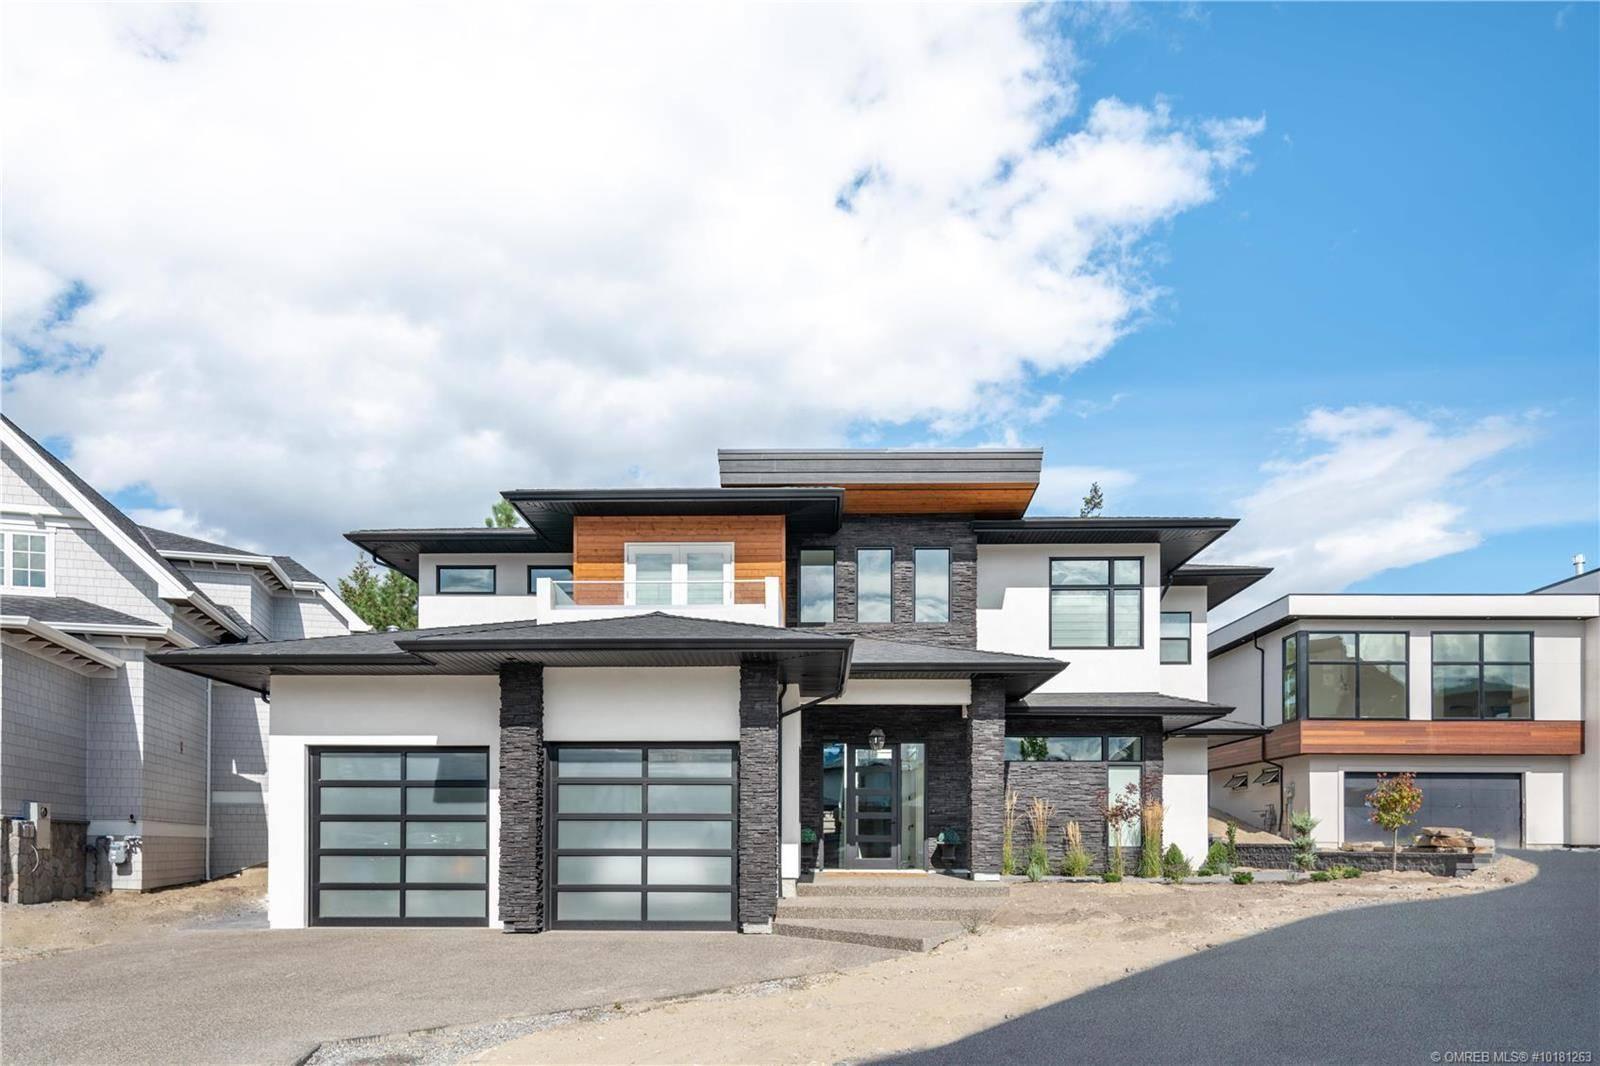 House for sale at 1150 Mission Ridge Rd Unit 16 Kelowna British Columbia - MLS: 10181263